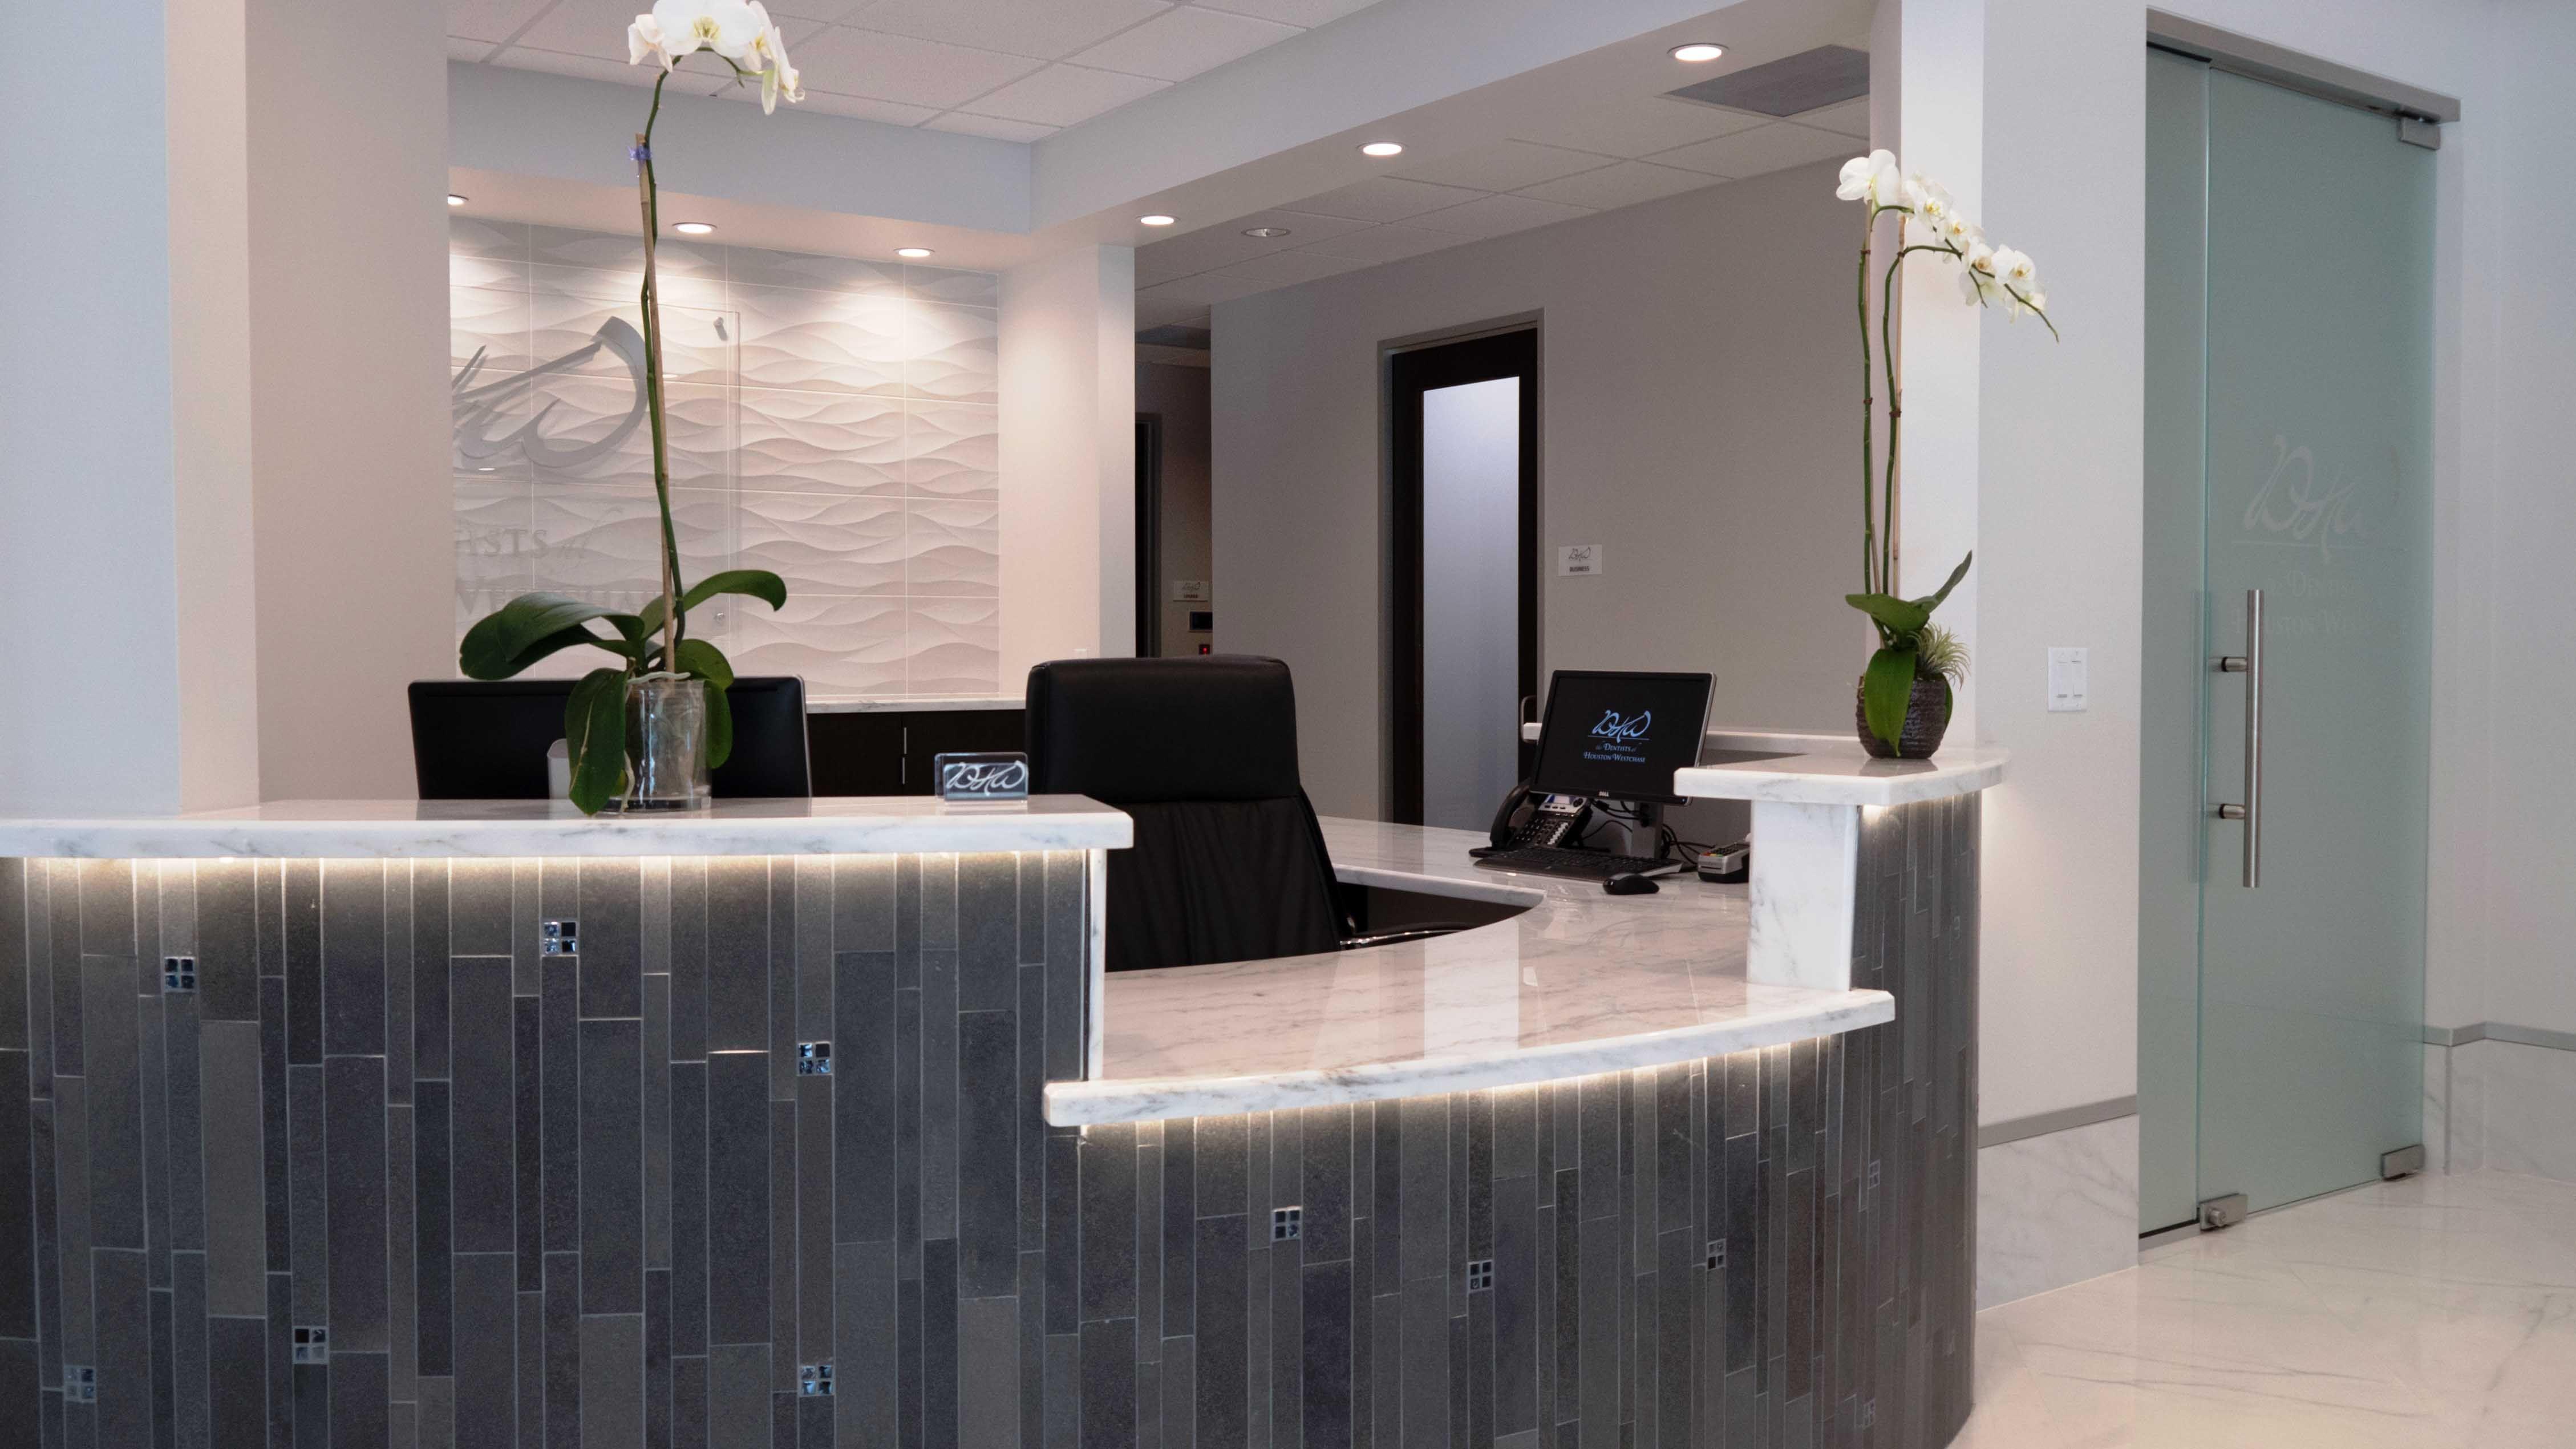 dental office design competition - Dental Office Design Ideas